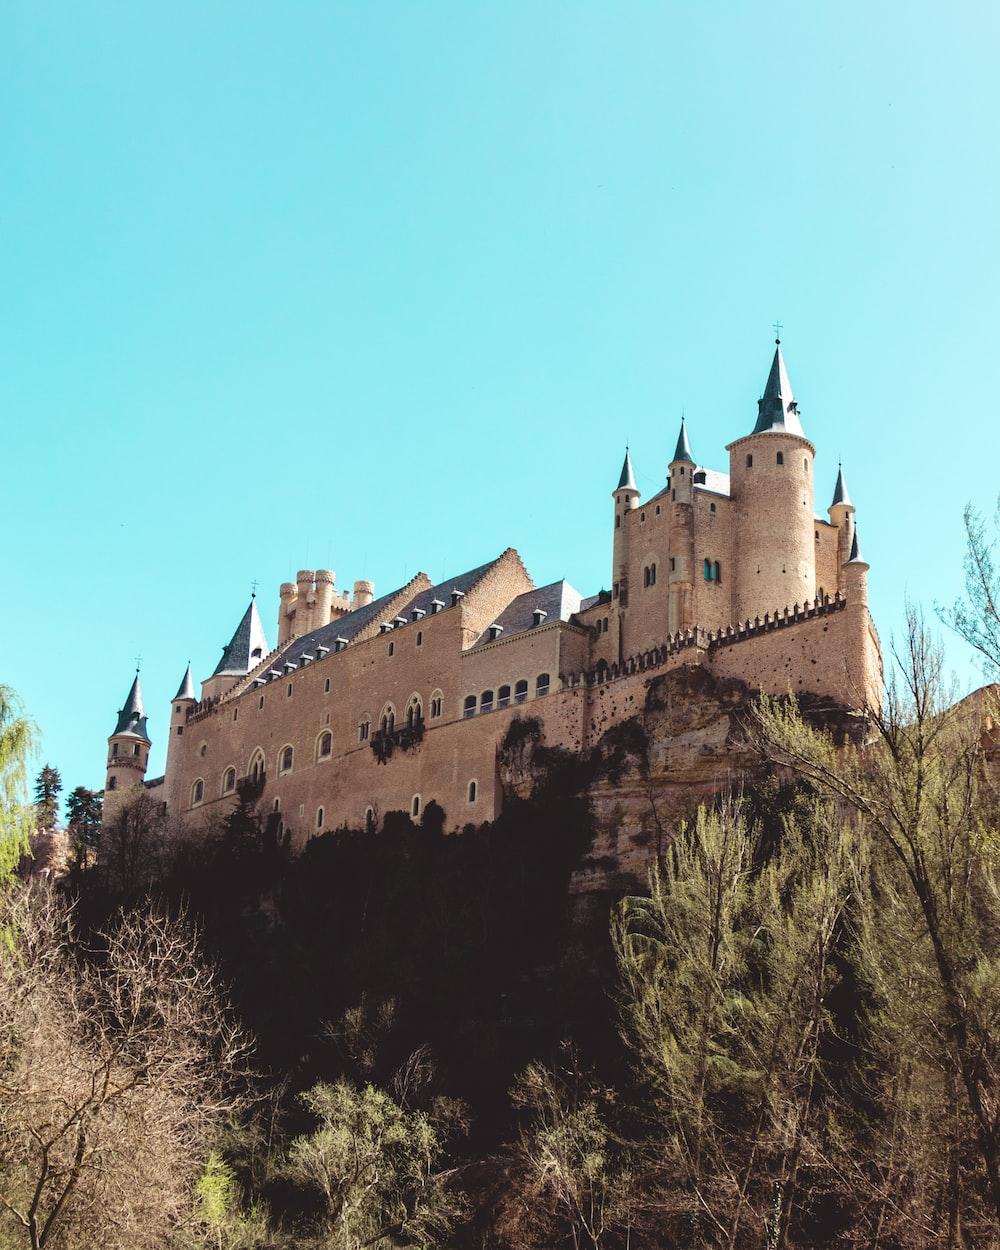 brown castle on hills